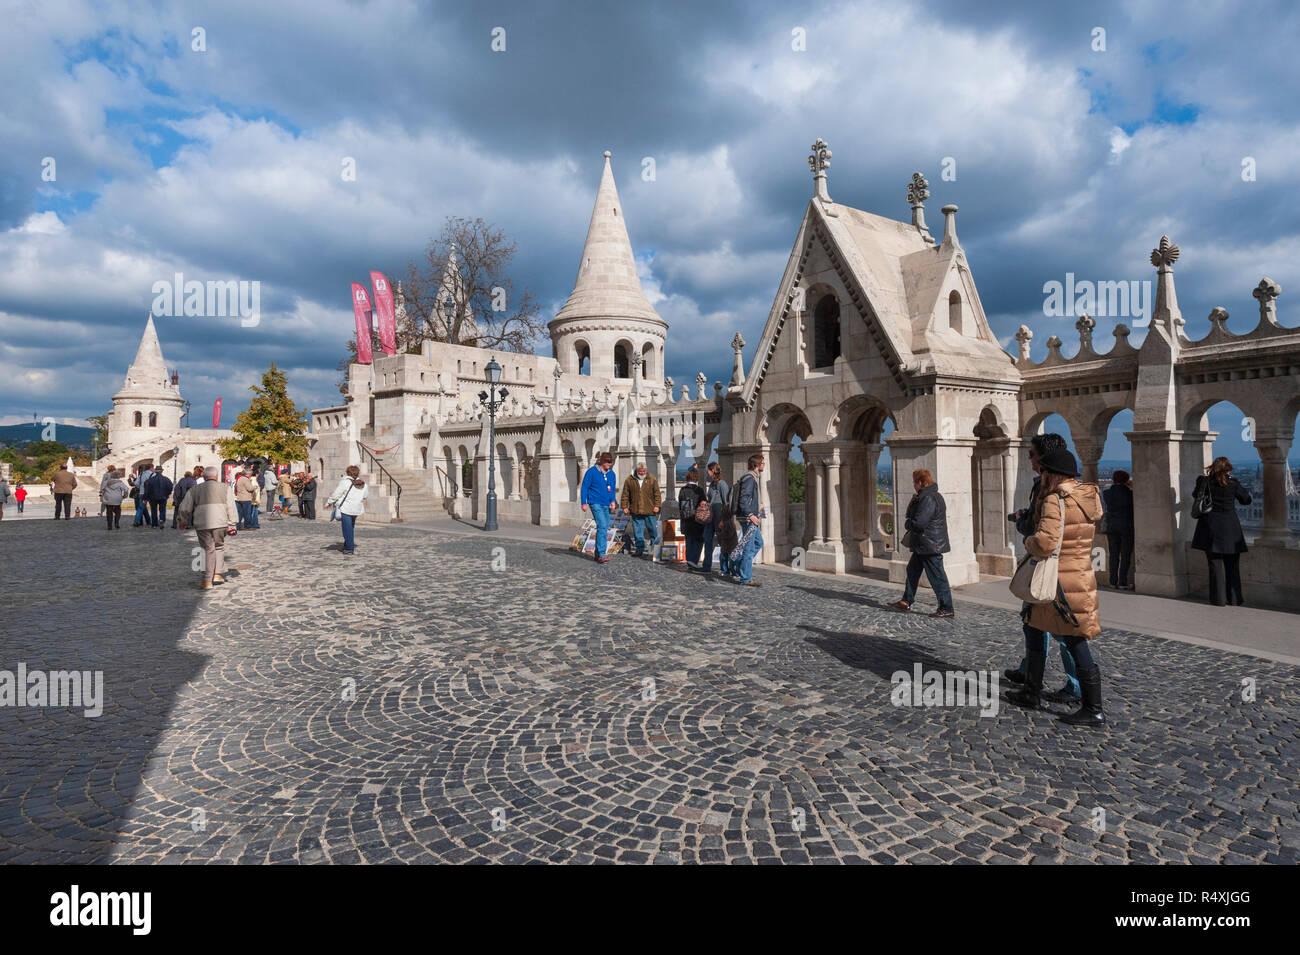 Budapest - tourists explore the Halászbástya or Fisherman's Bastion - Stock Image